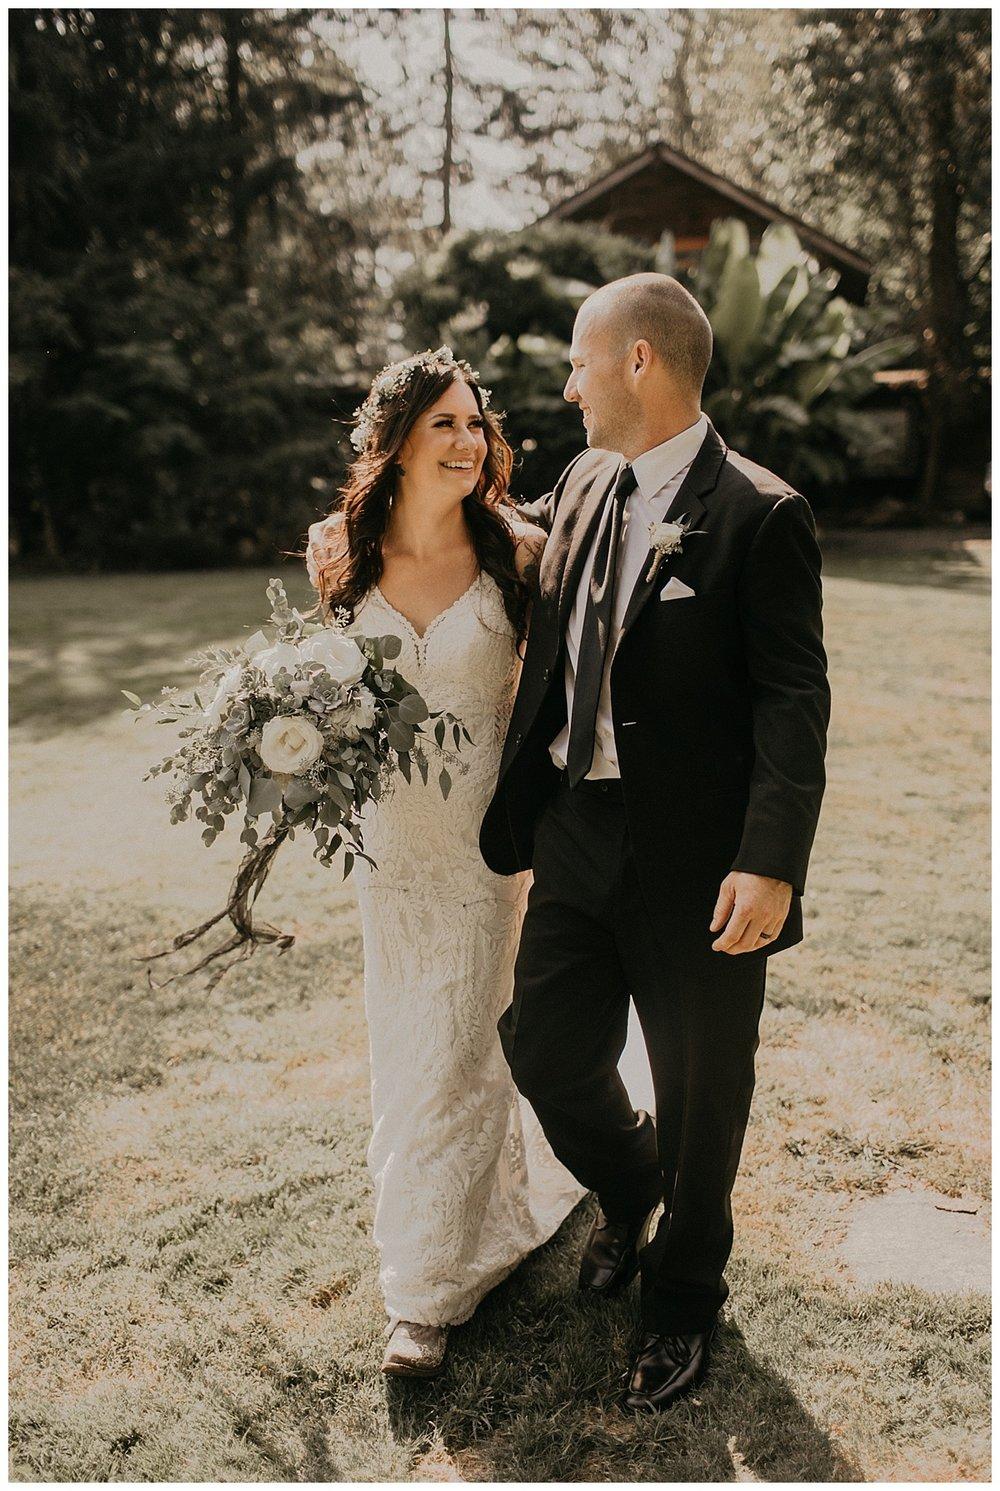 Samantha-McFarlen-PNW-Wedding-Photographer-Maroni-Meadows_1961.jpg